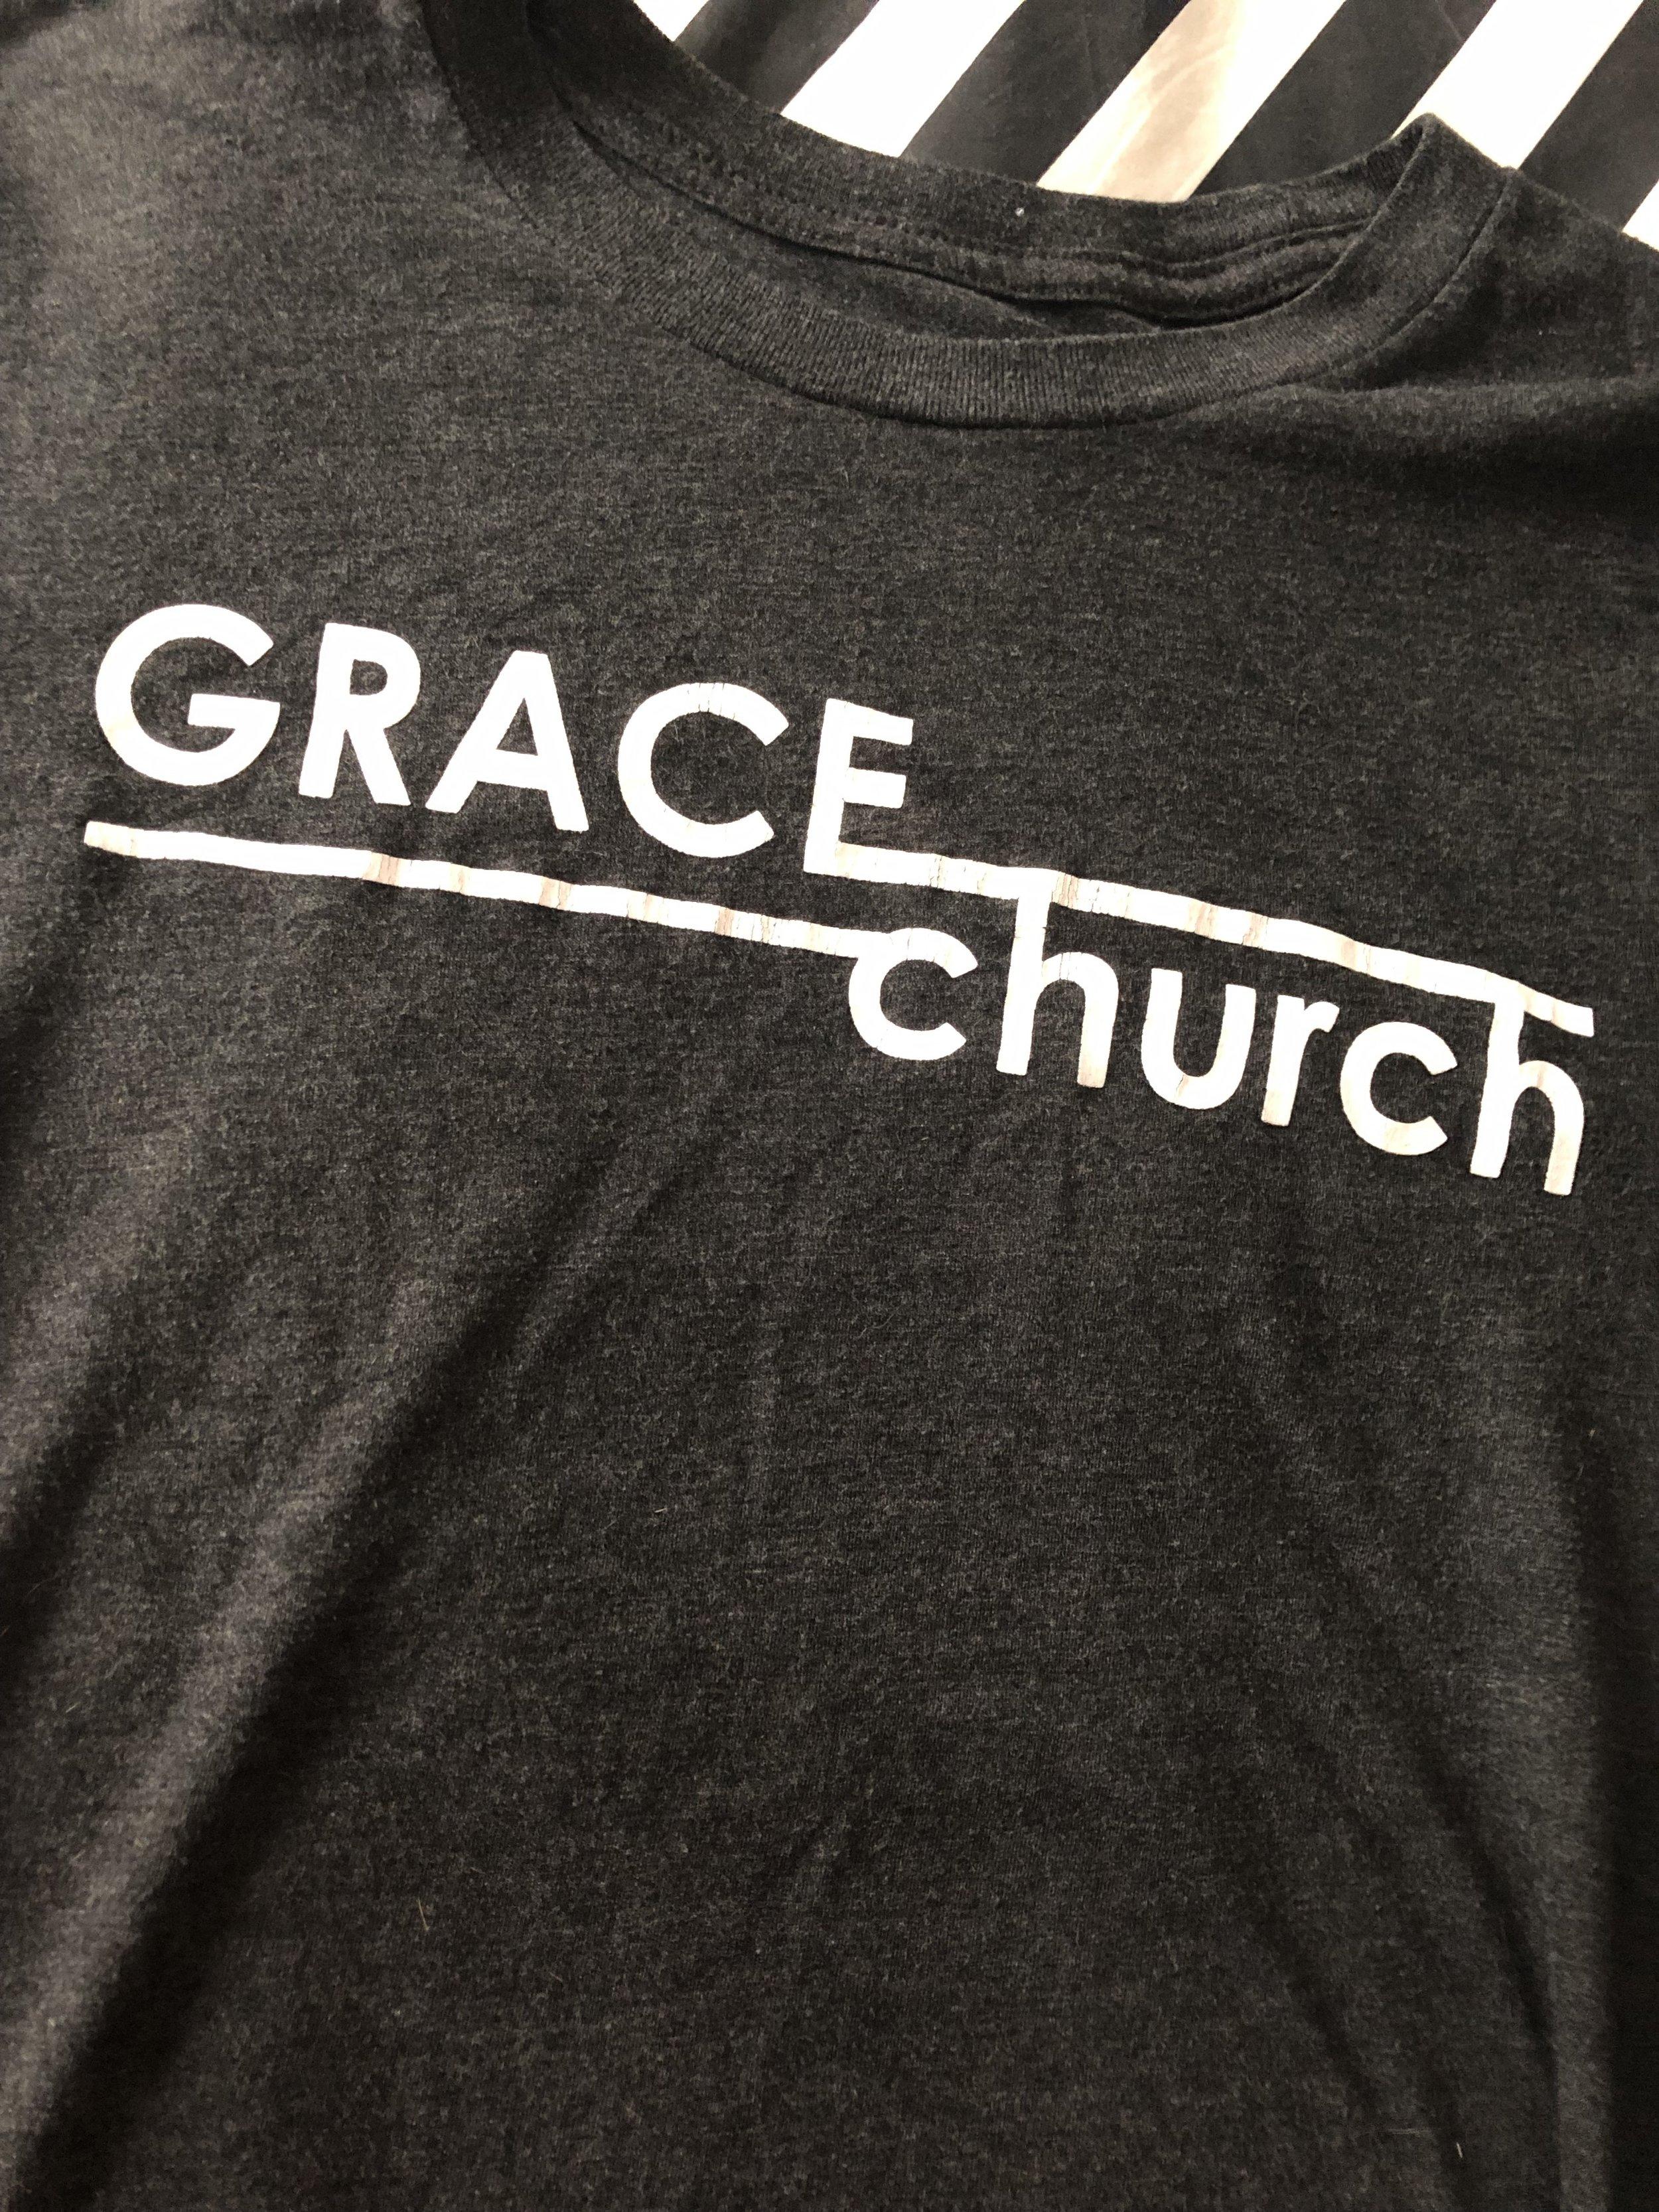 Gc Shirt.jpg